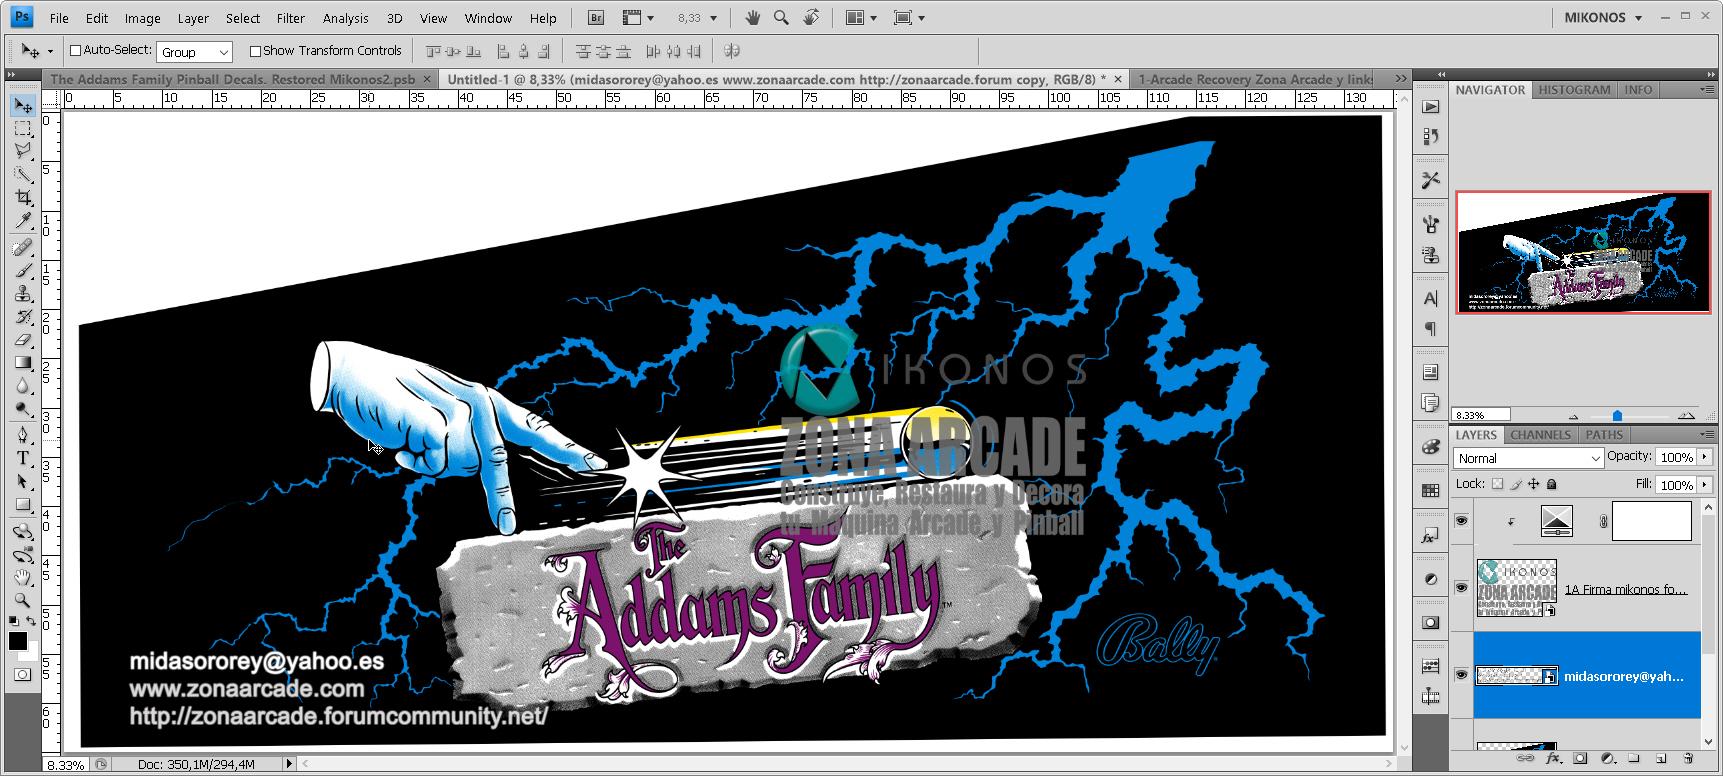 The-Addams-Family-Left-Side-Art-Pinball-Decal.-Restored-Mikonos1.jpg